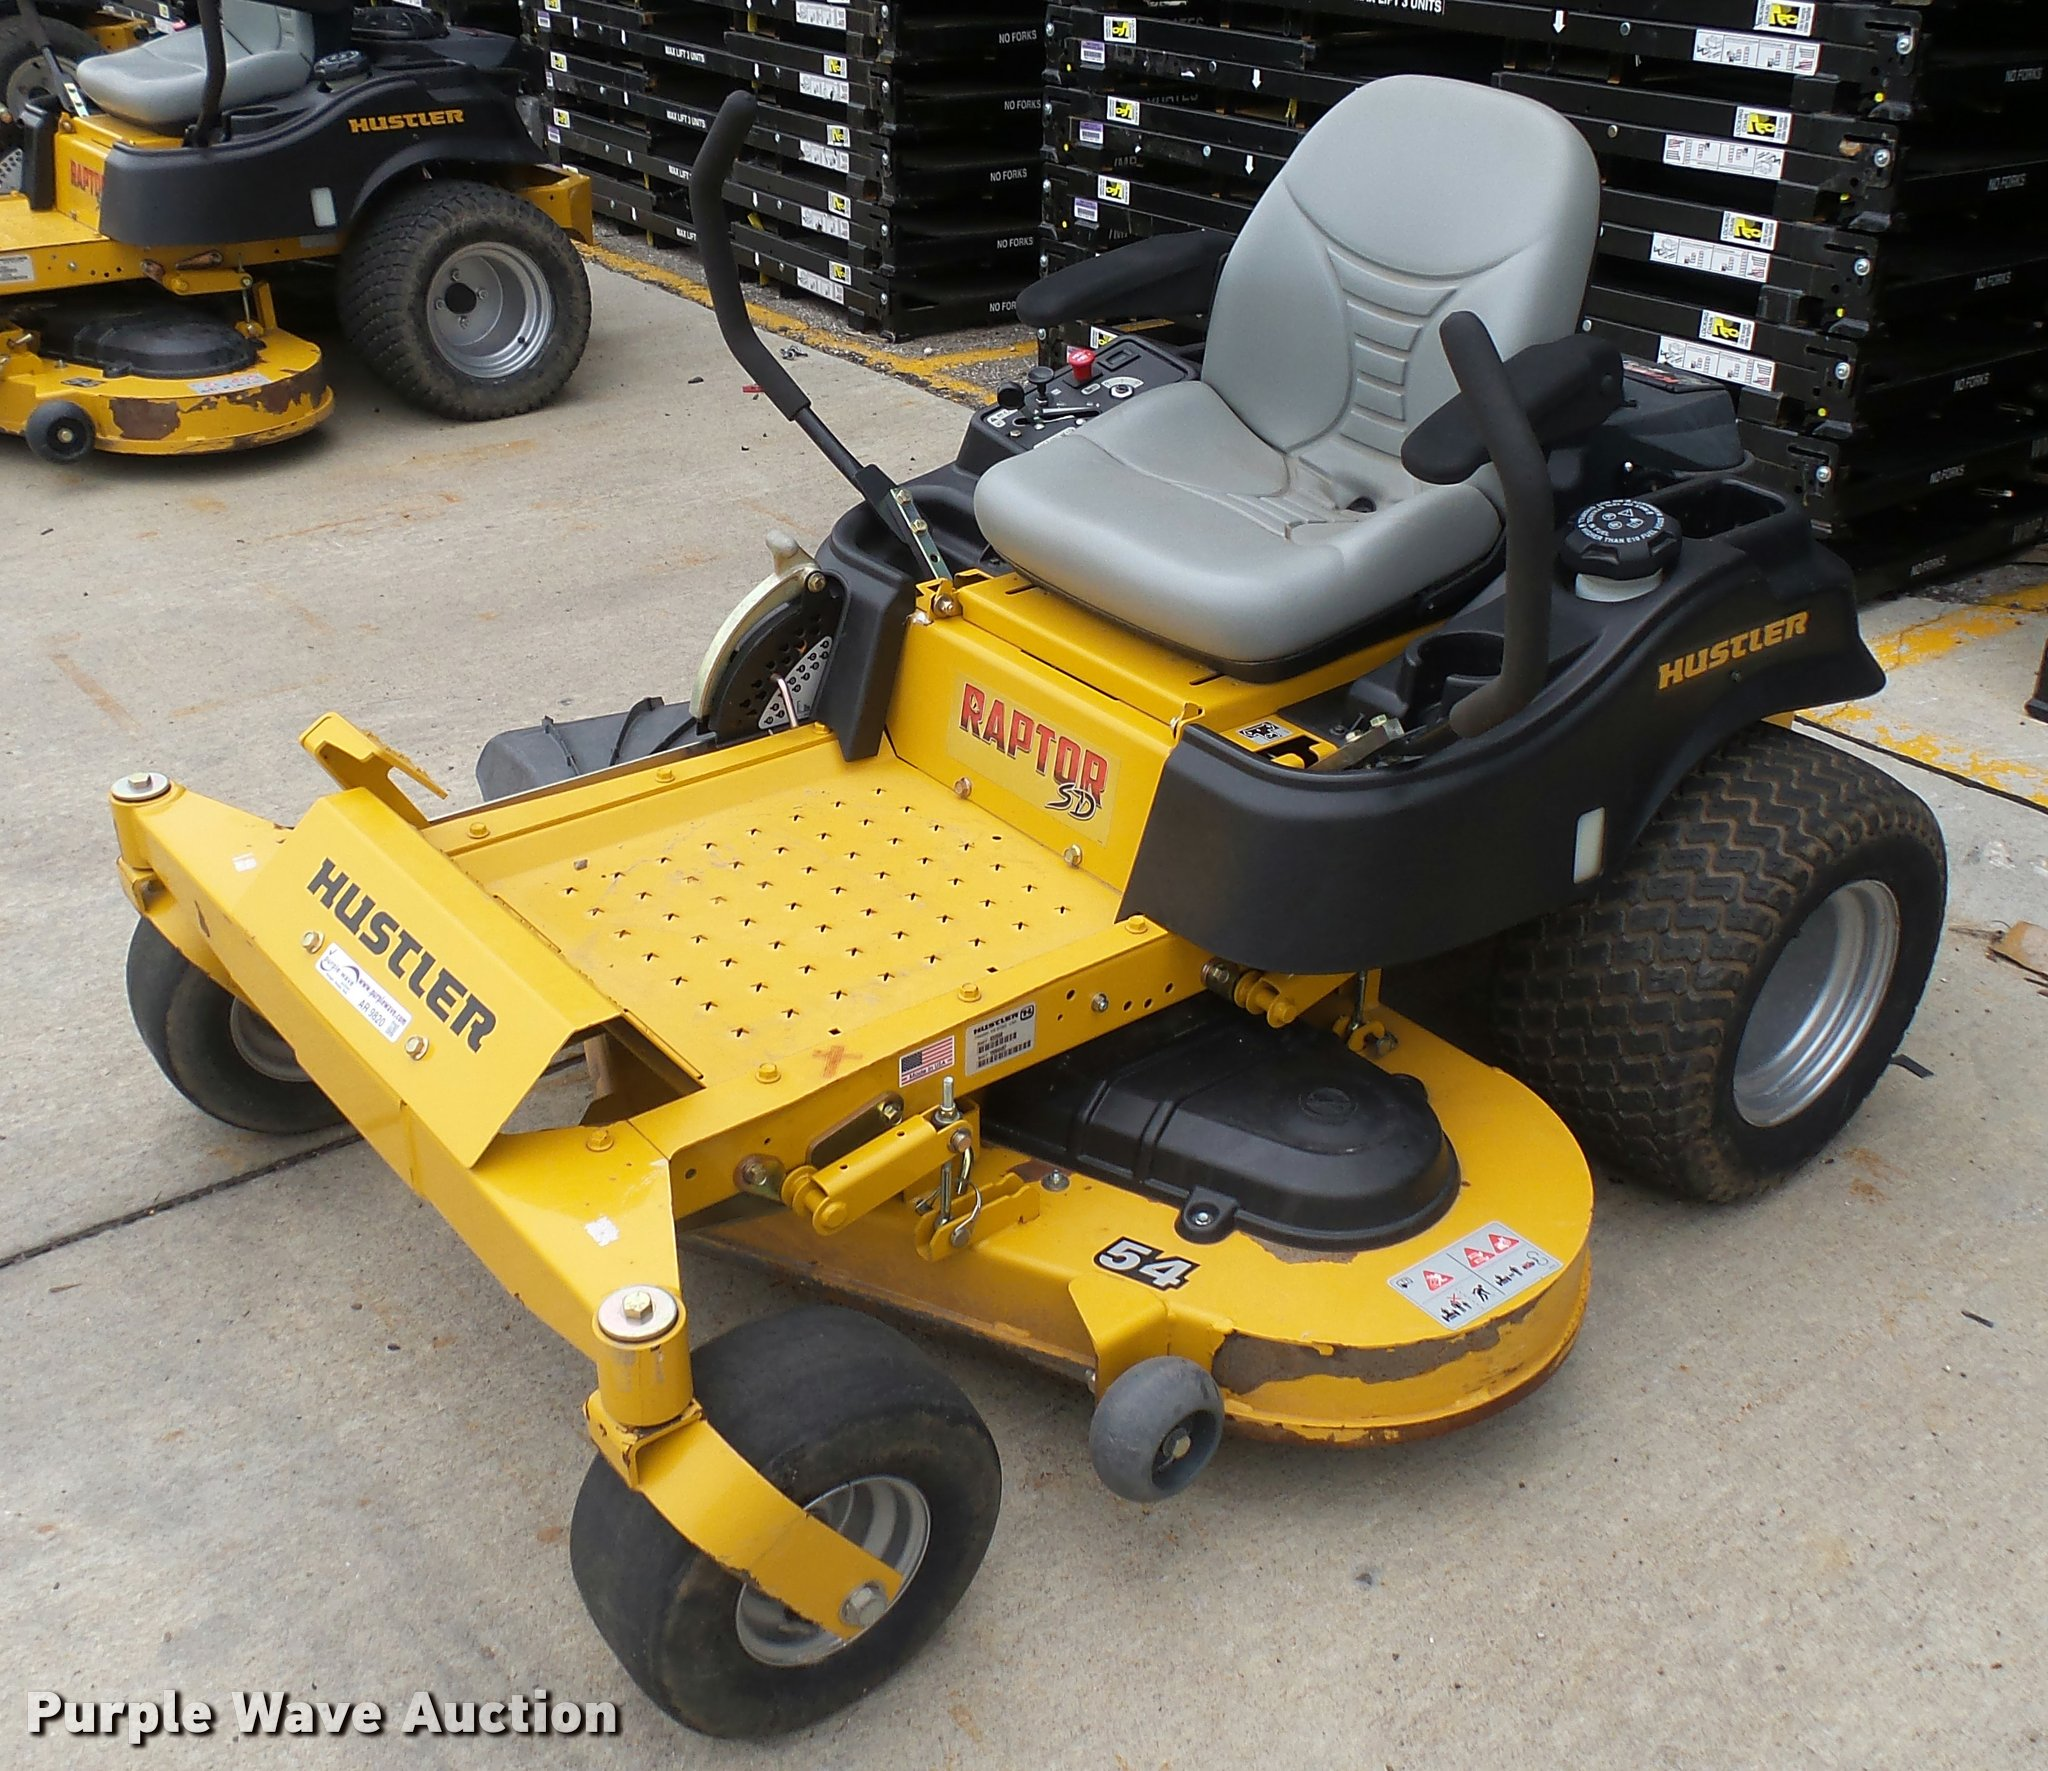 2015 Hustler Raptor SD ZTR lawn mower Item AR9820